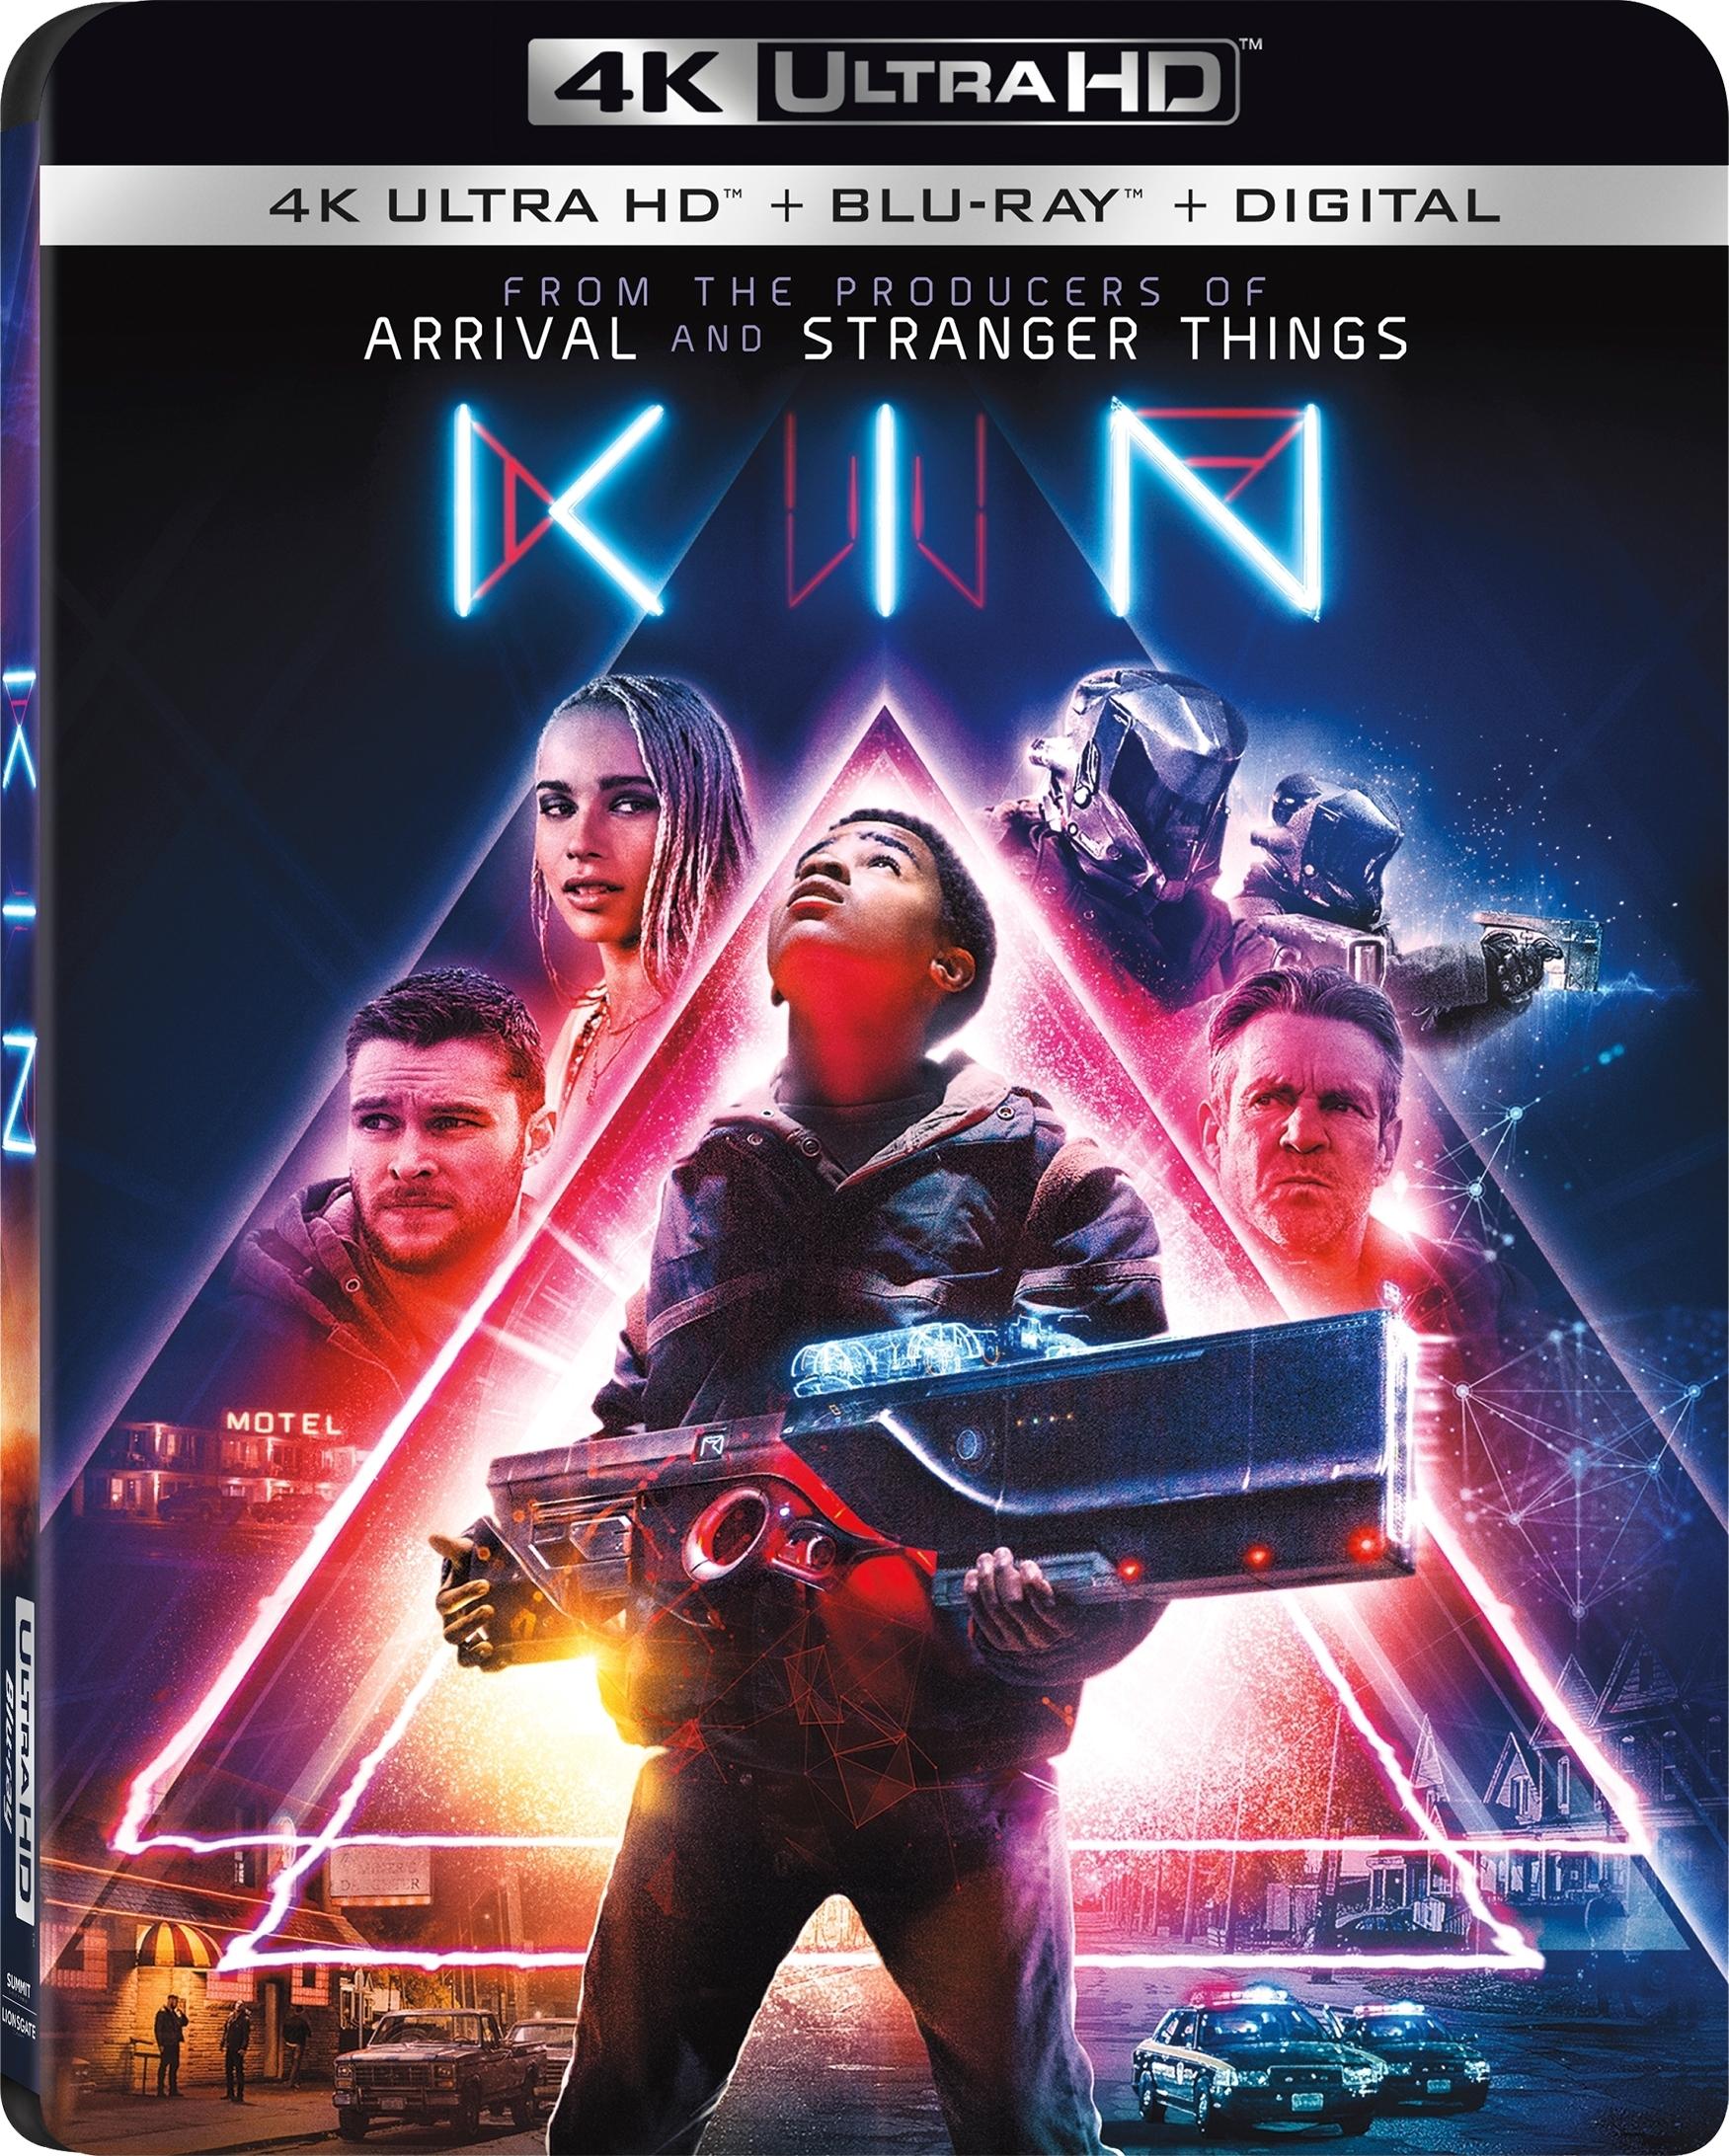 Kin 4K (2018) Ultra HD Blu-ray